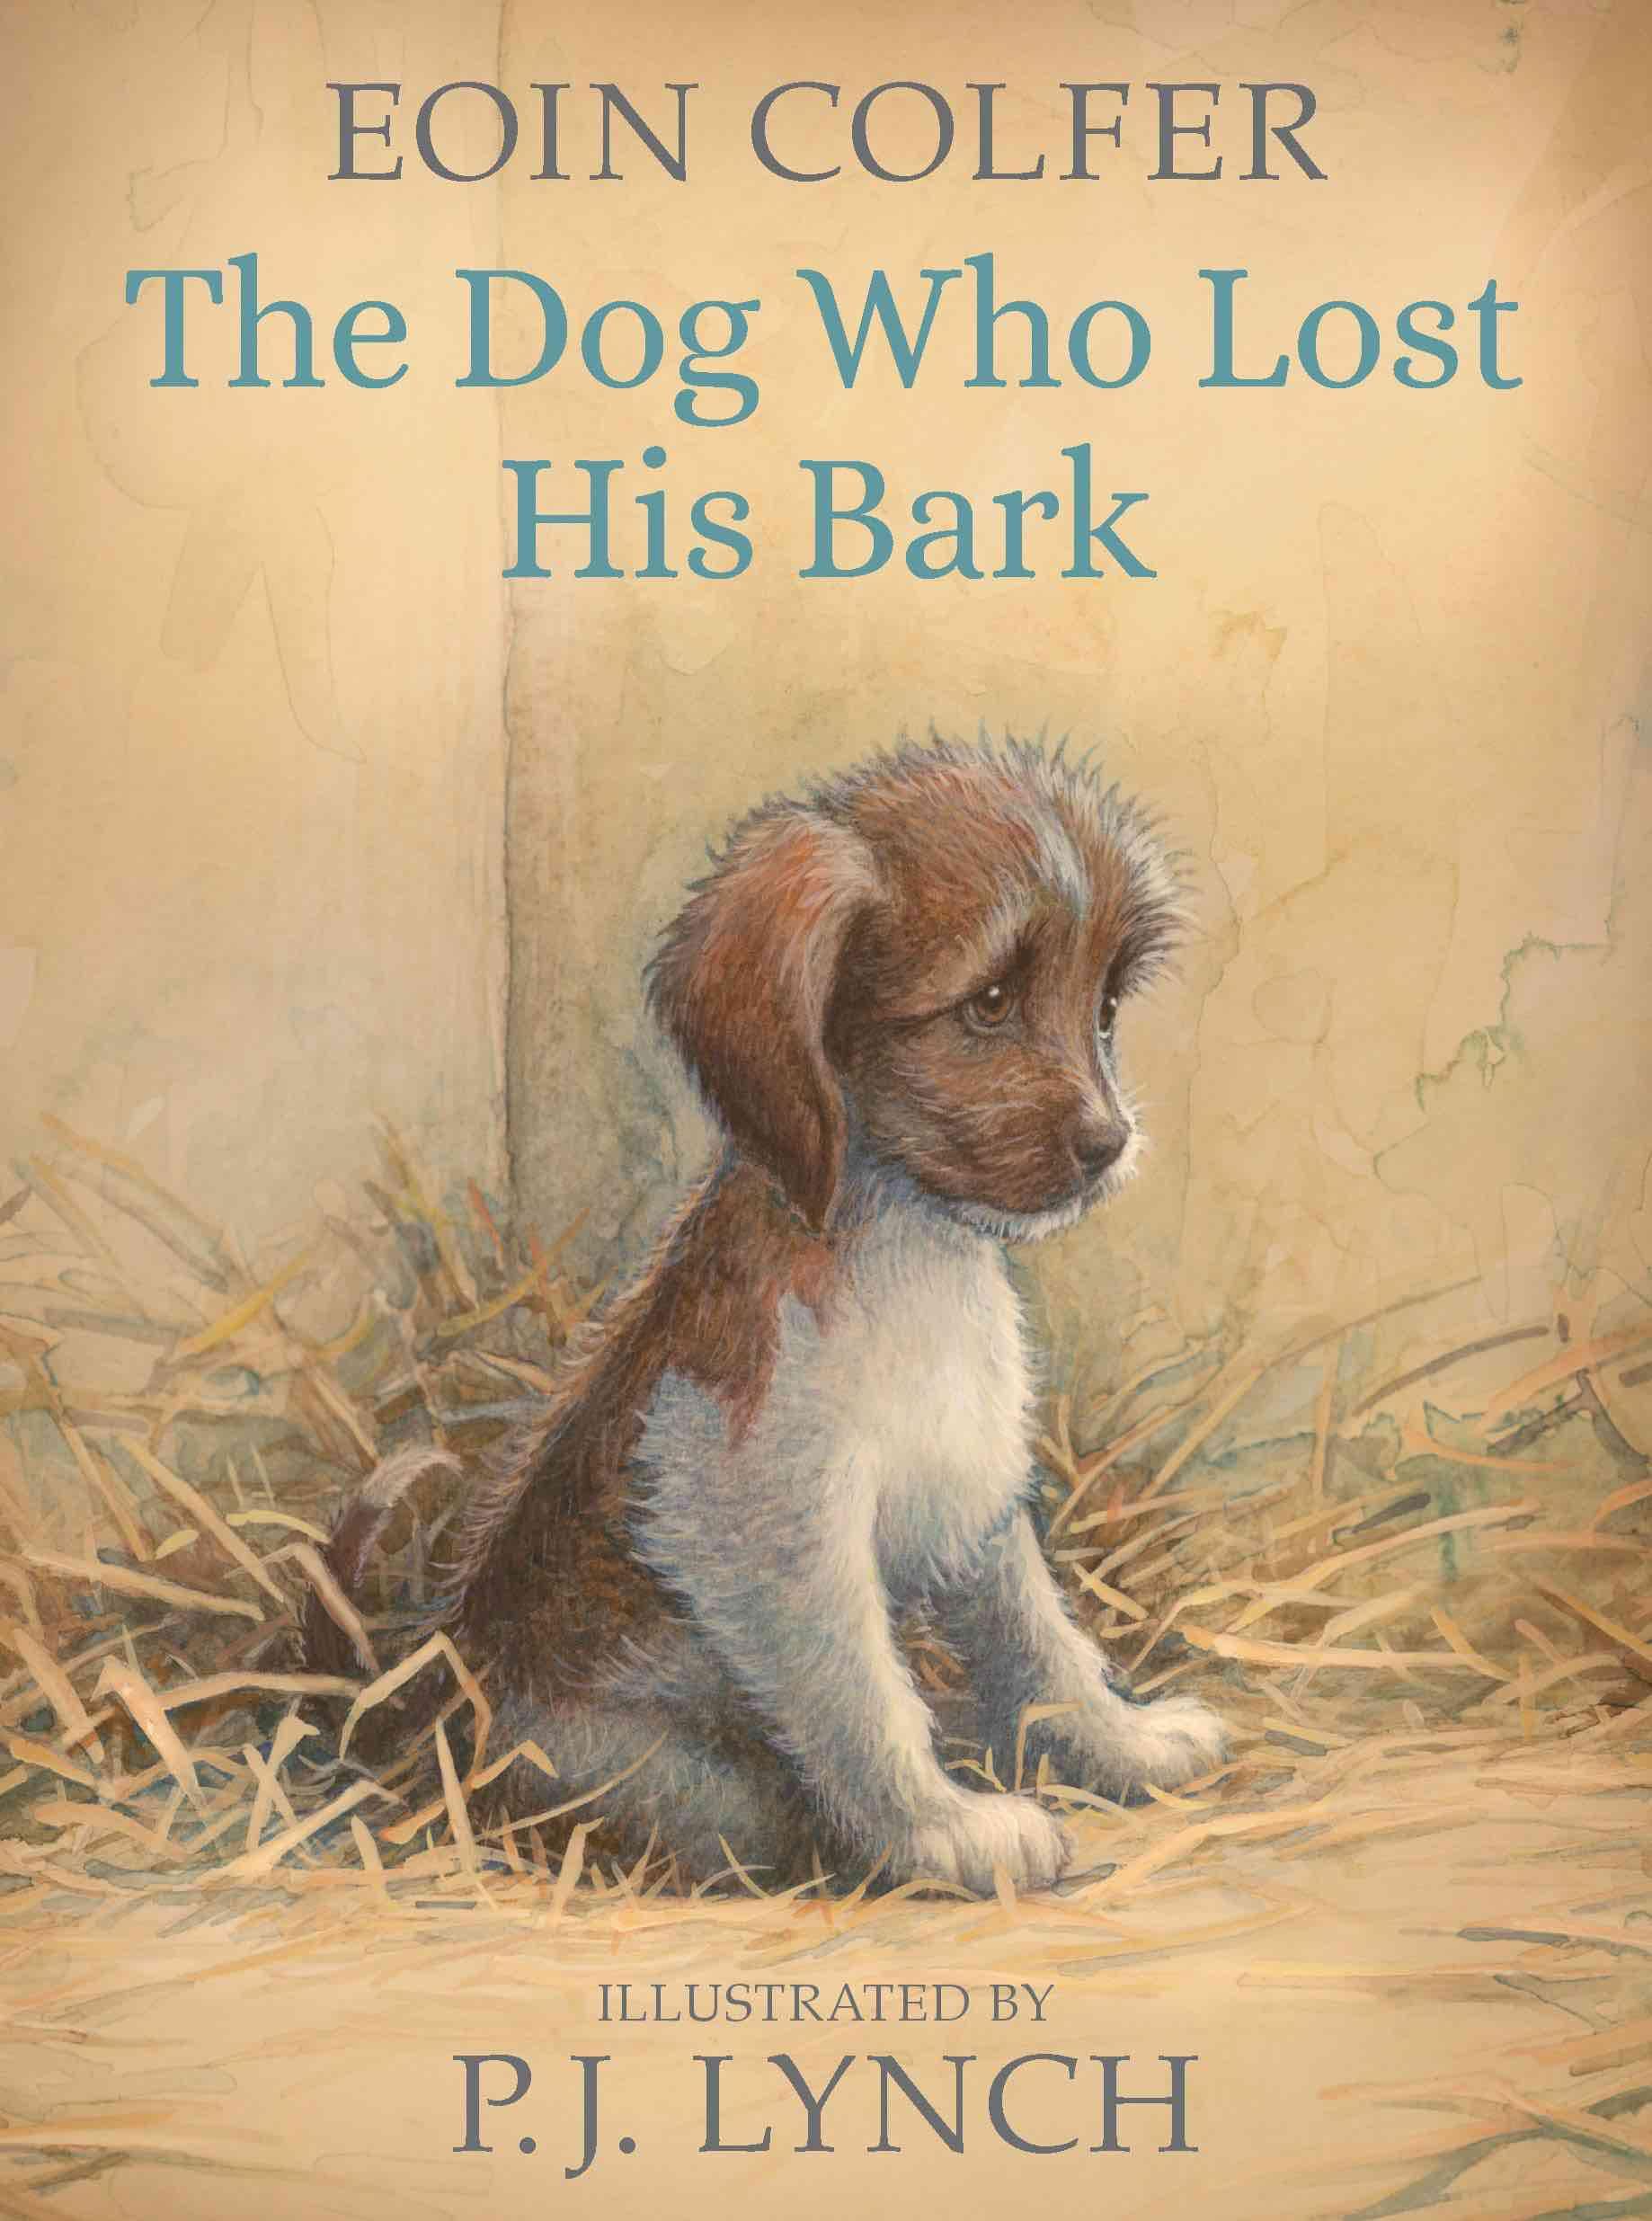 Dog who lost bark